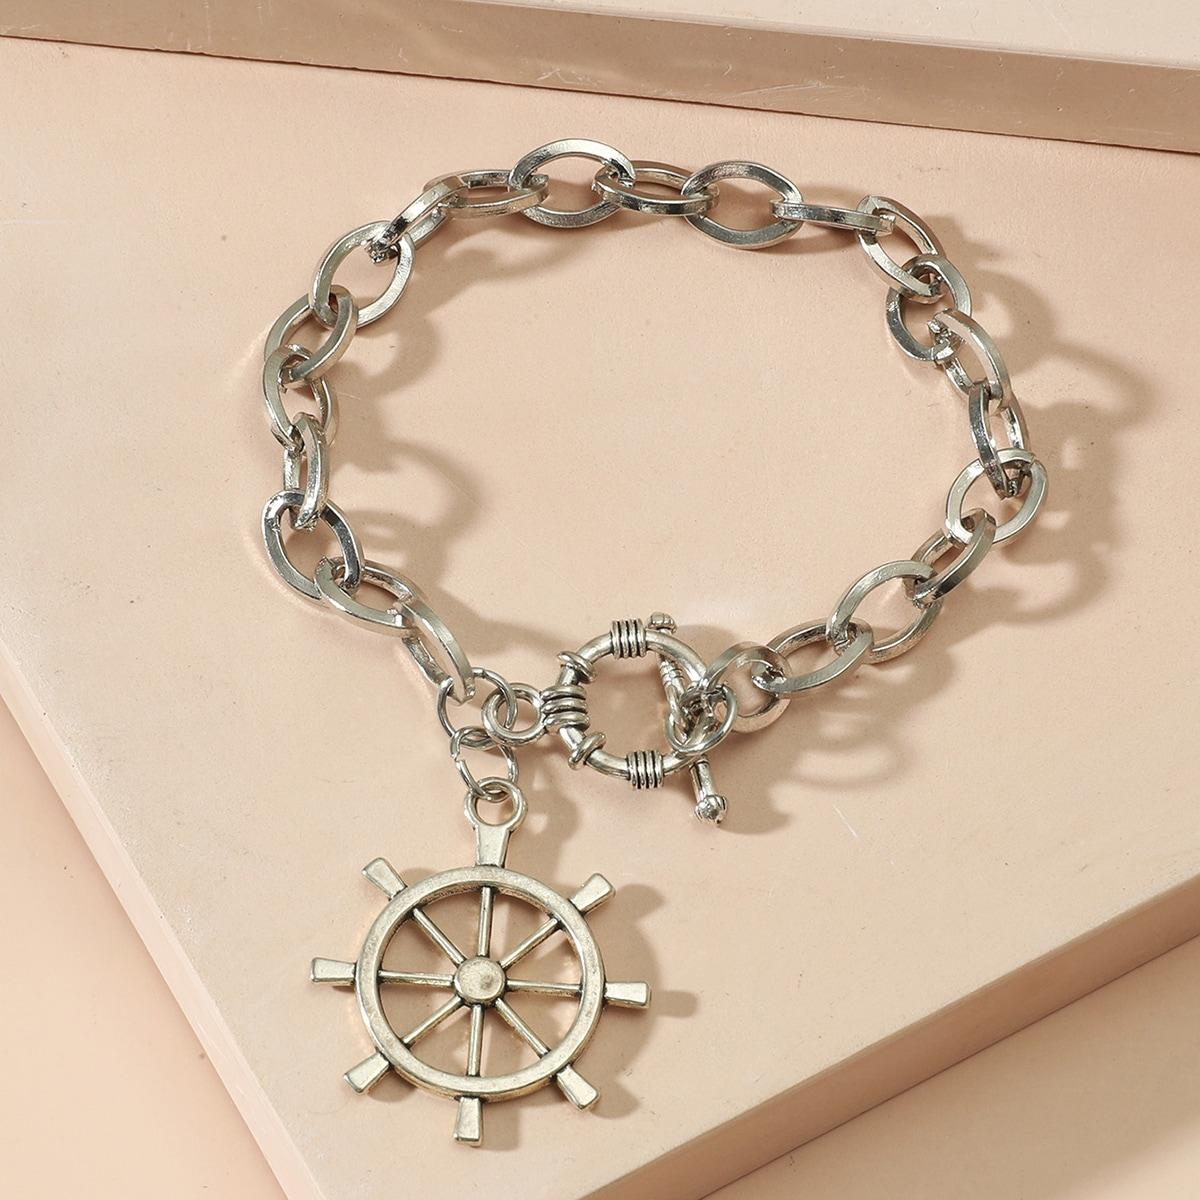 Rudder Charm Chain Bracelet, SHEIN  - buy with discount